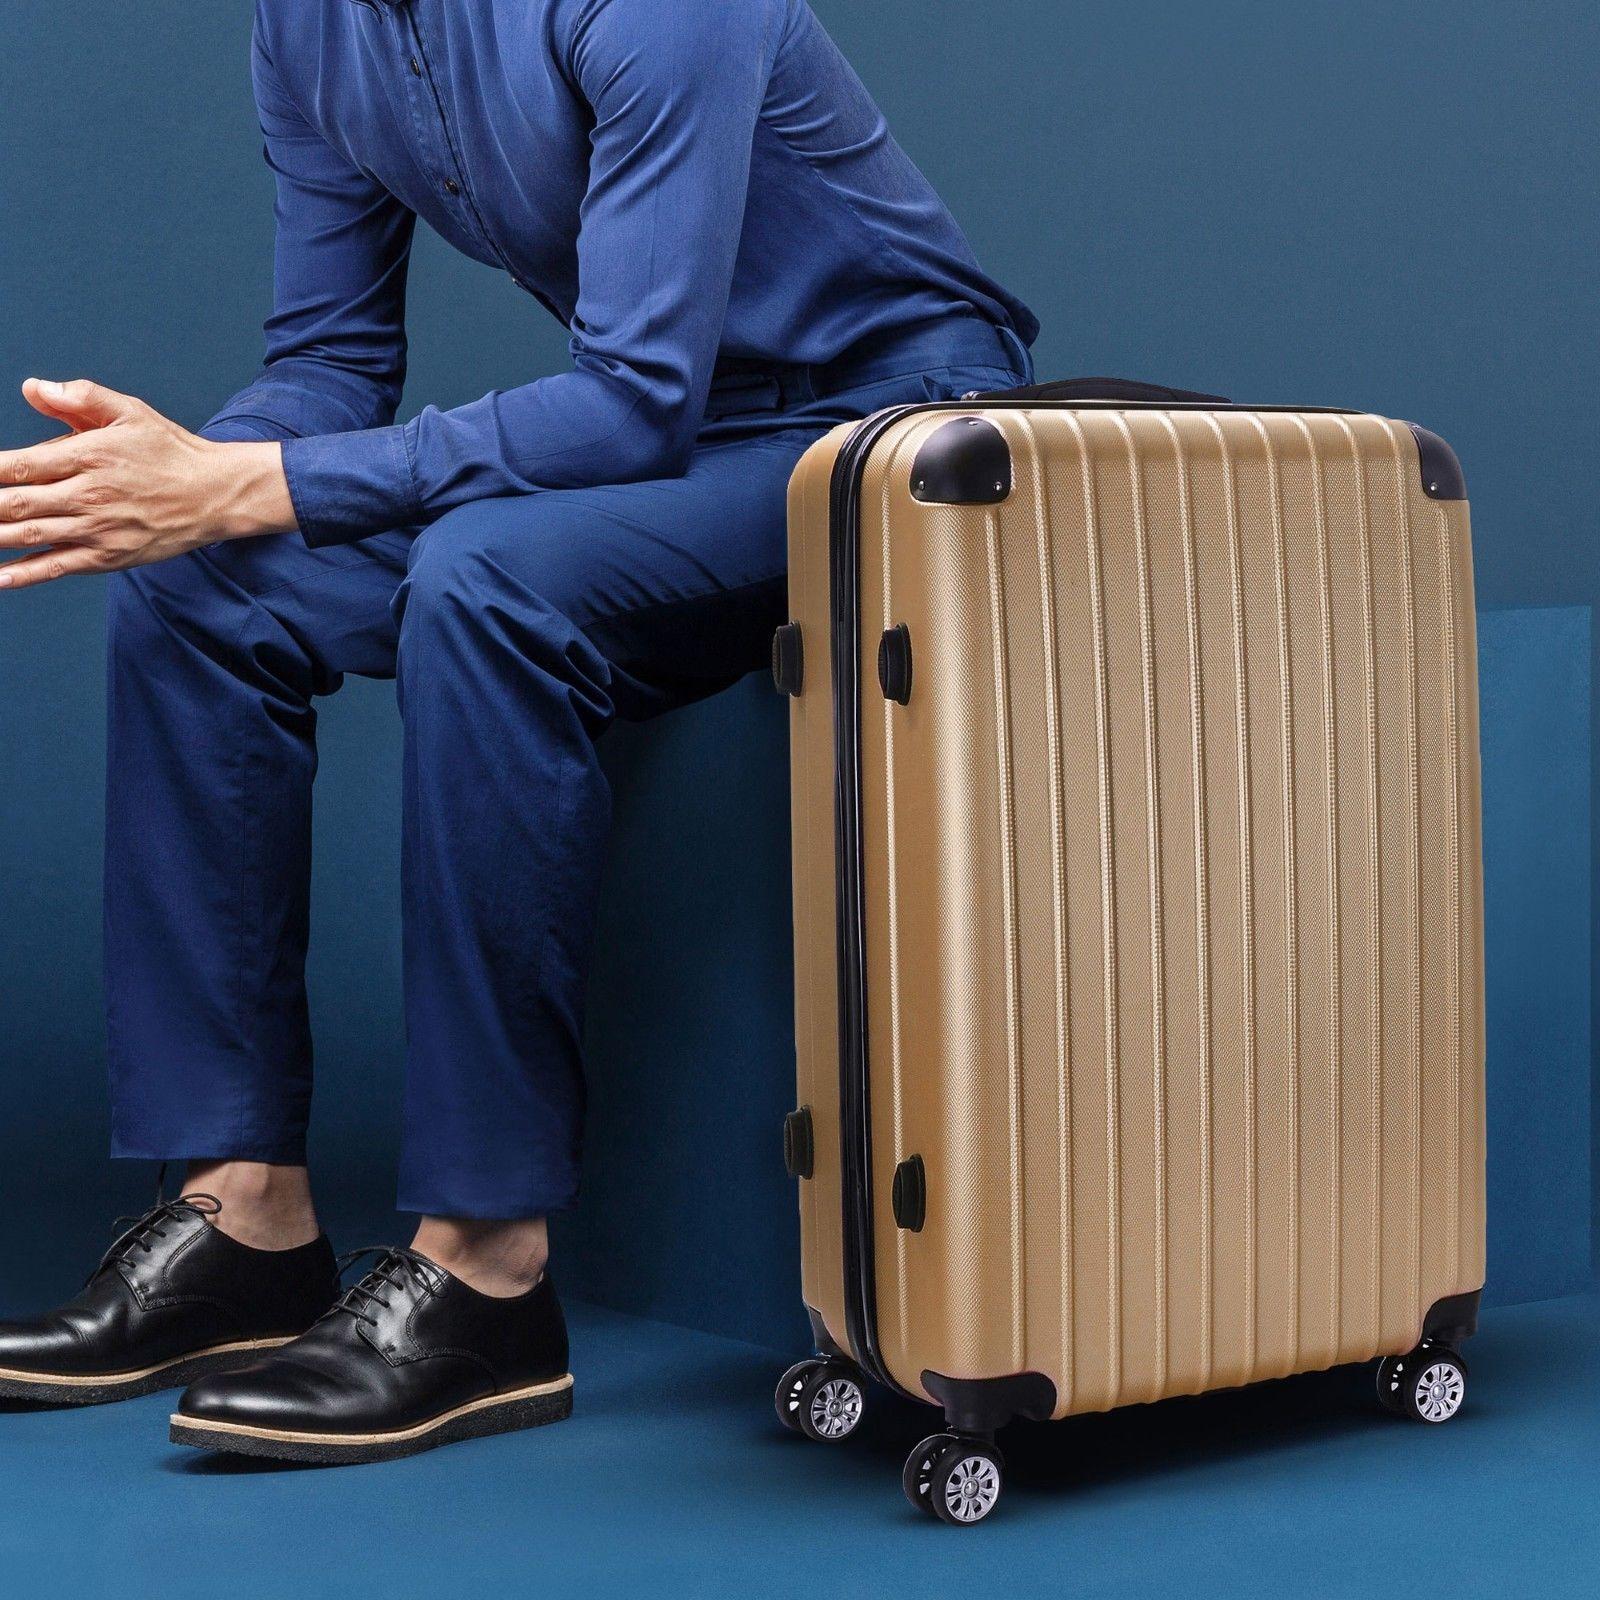 Milano-Premium-3pc-ABS-Luggage-Suitcase-Luxury-Hard-Case-Shockproof-Travel-Set thumbnail 16